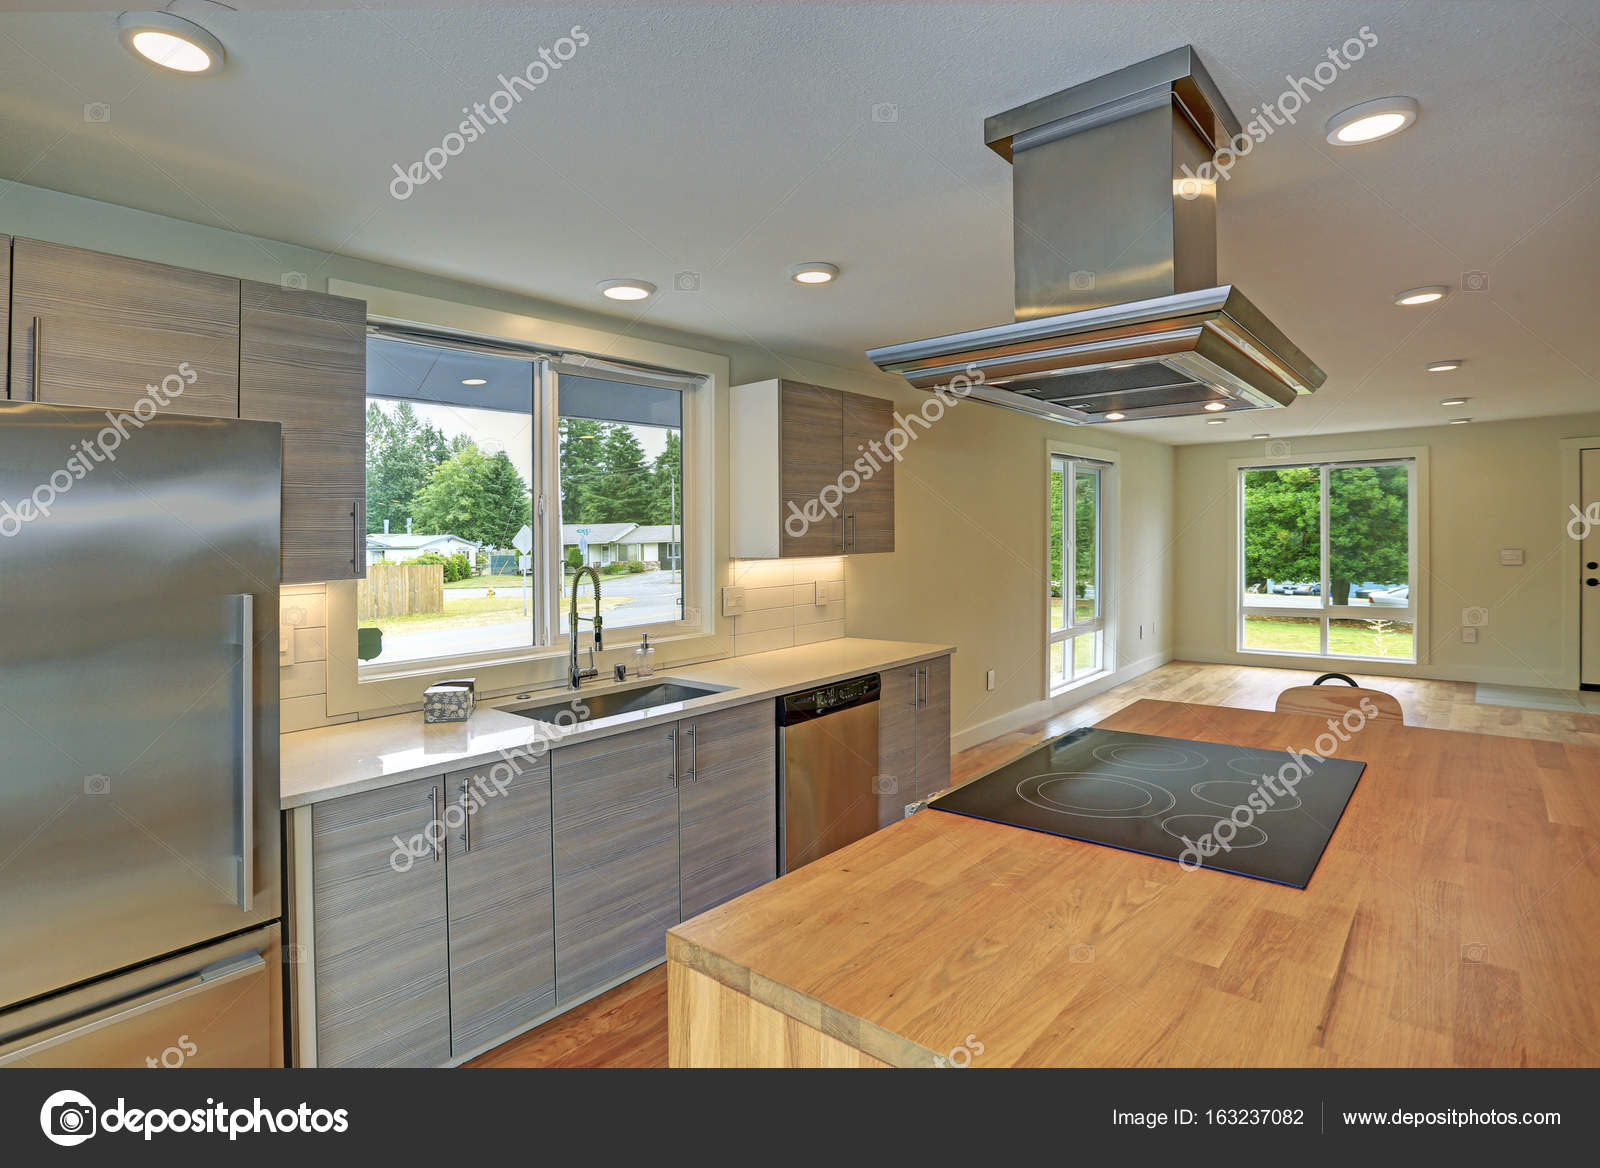 newly remodeled kitchen boasts kitchen island with a hood stock photo 163237082 - Newly Remodeled Kitchens